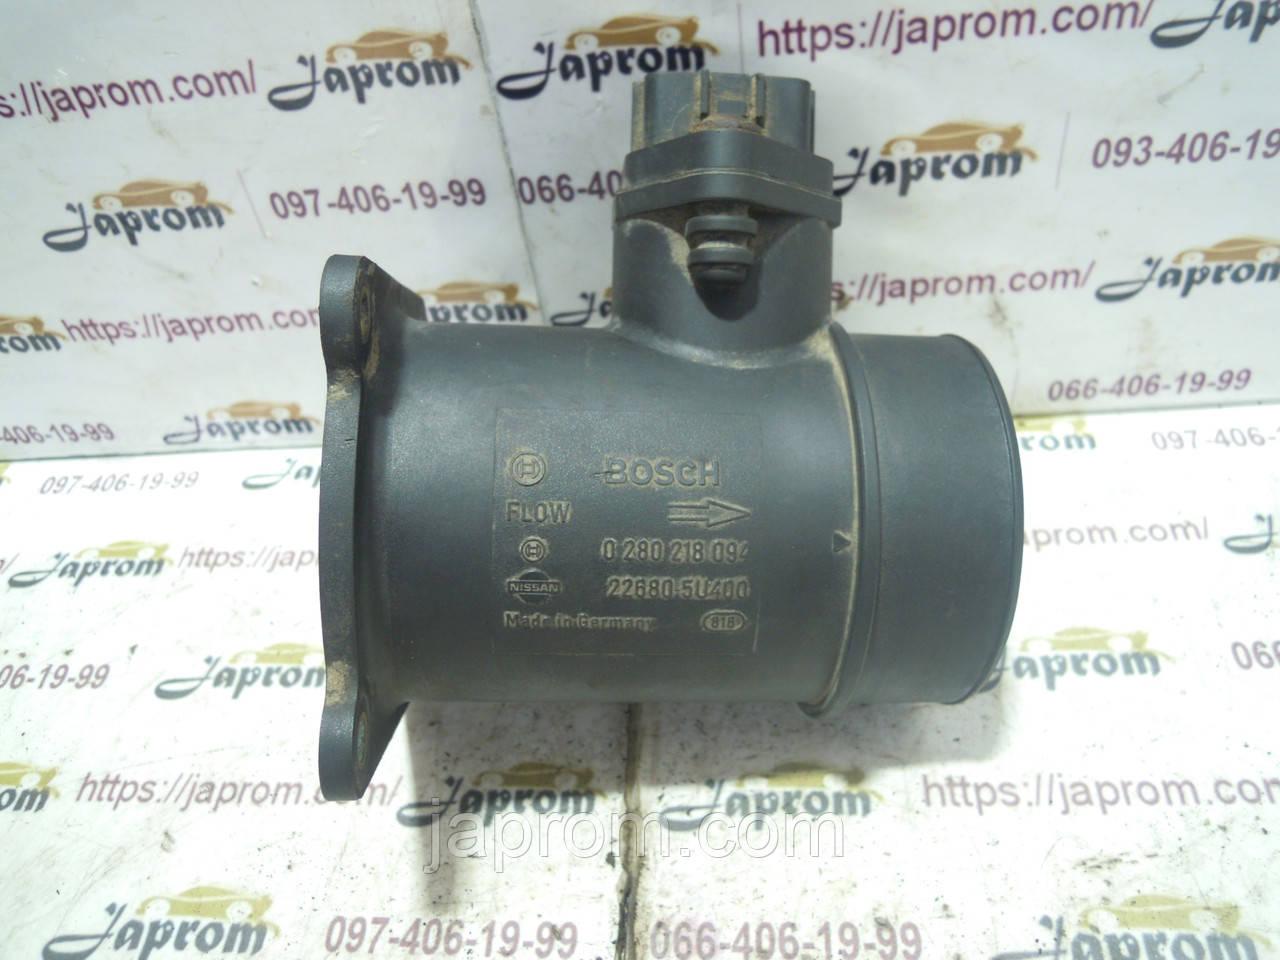 Датчик расхода (потока) воздуха расходомер M.A.F. Nissan Almera N16 Primera P11 P12 1.6 1.8 бензин